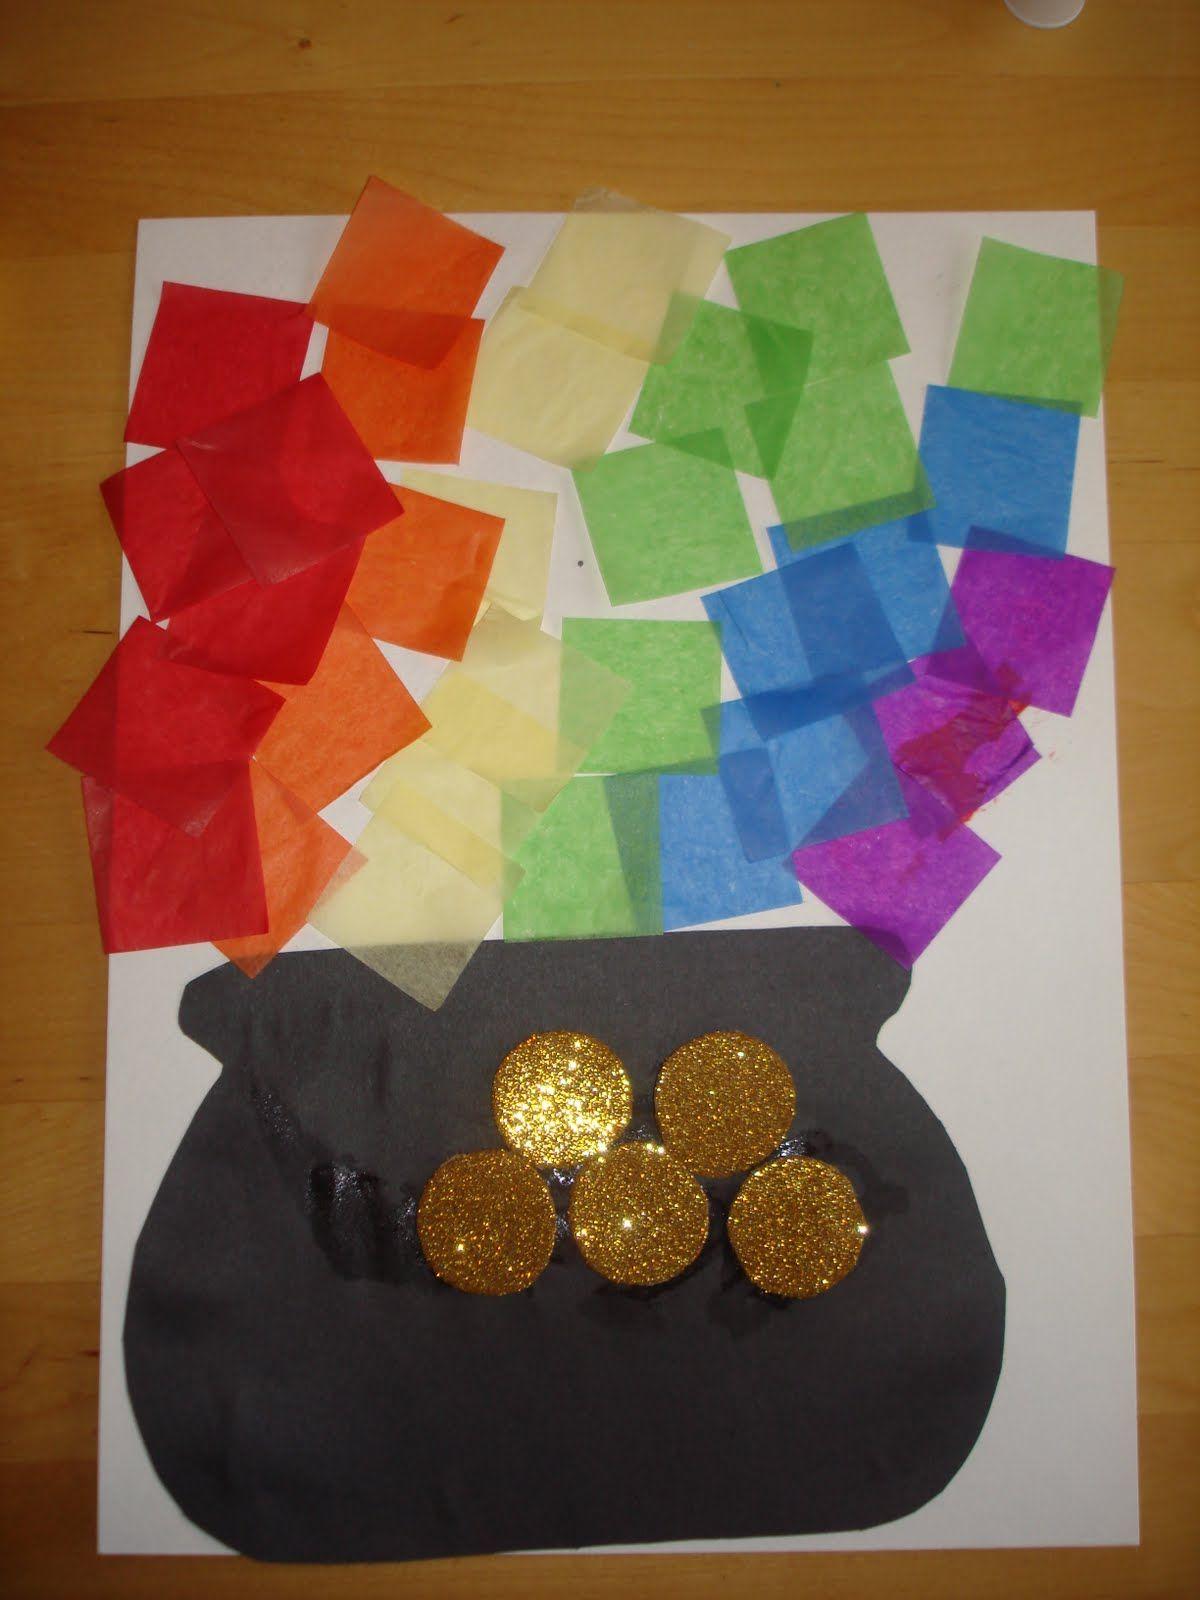 preschool art project ideas preschool craft ideas for memorial day preschool crafts 272